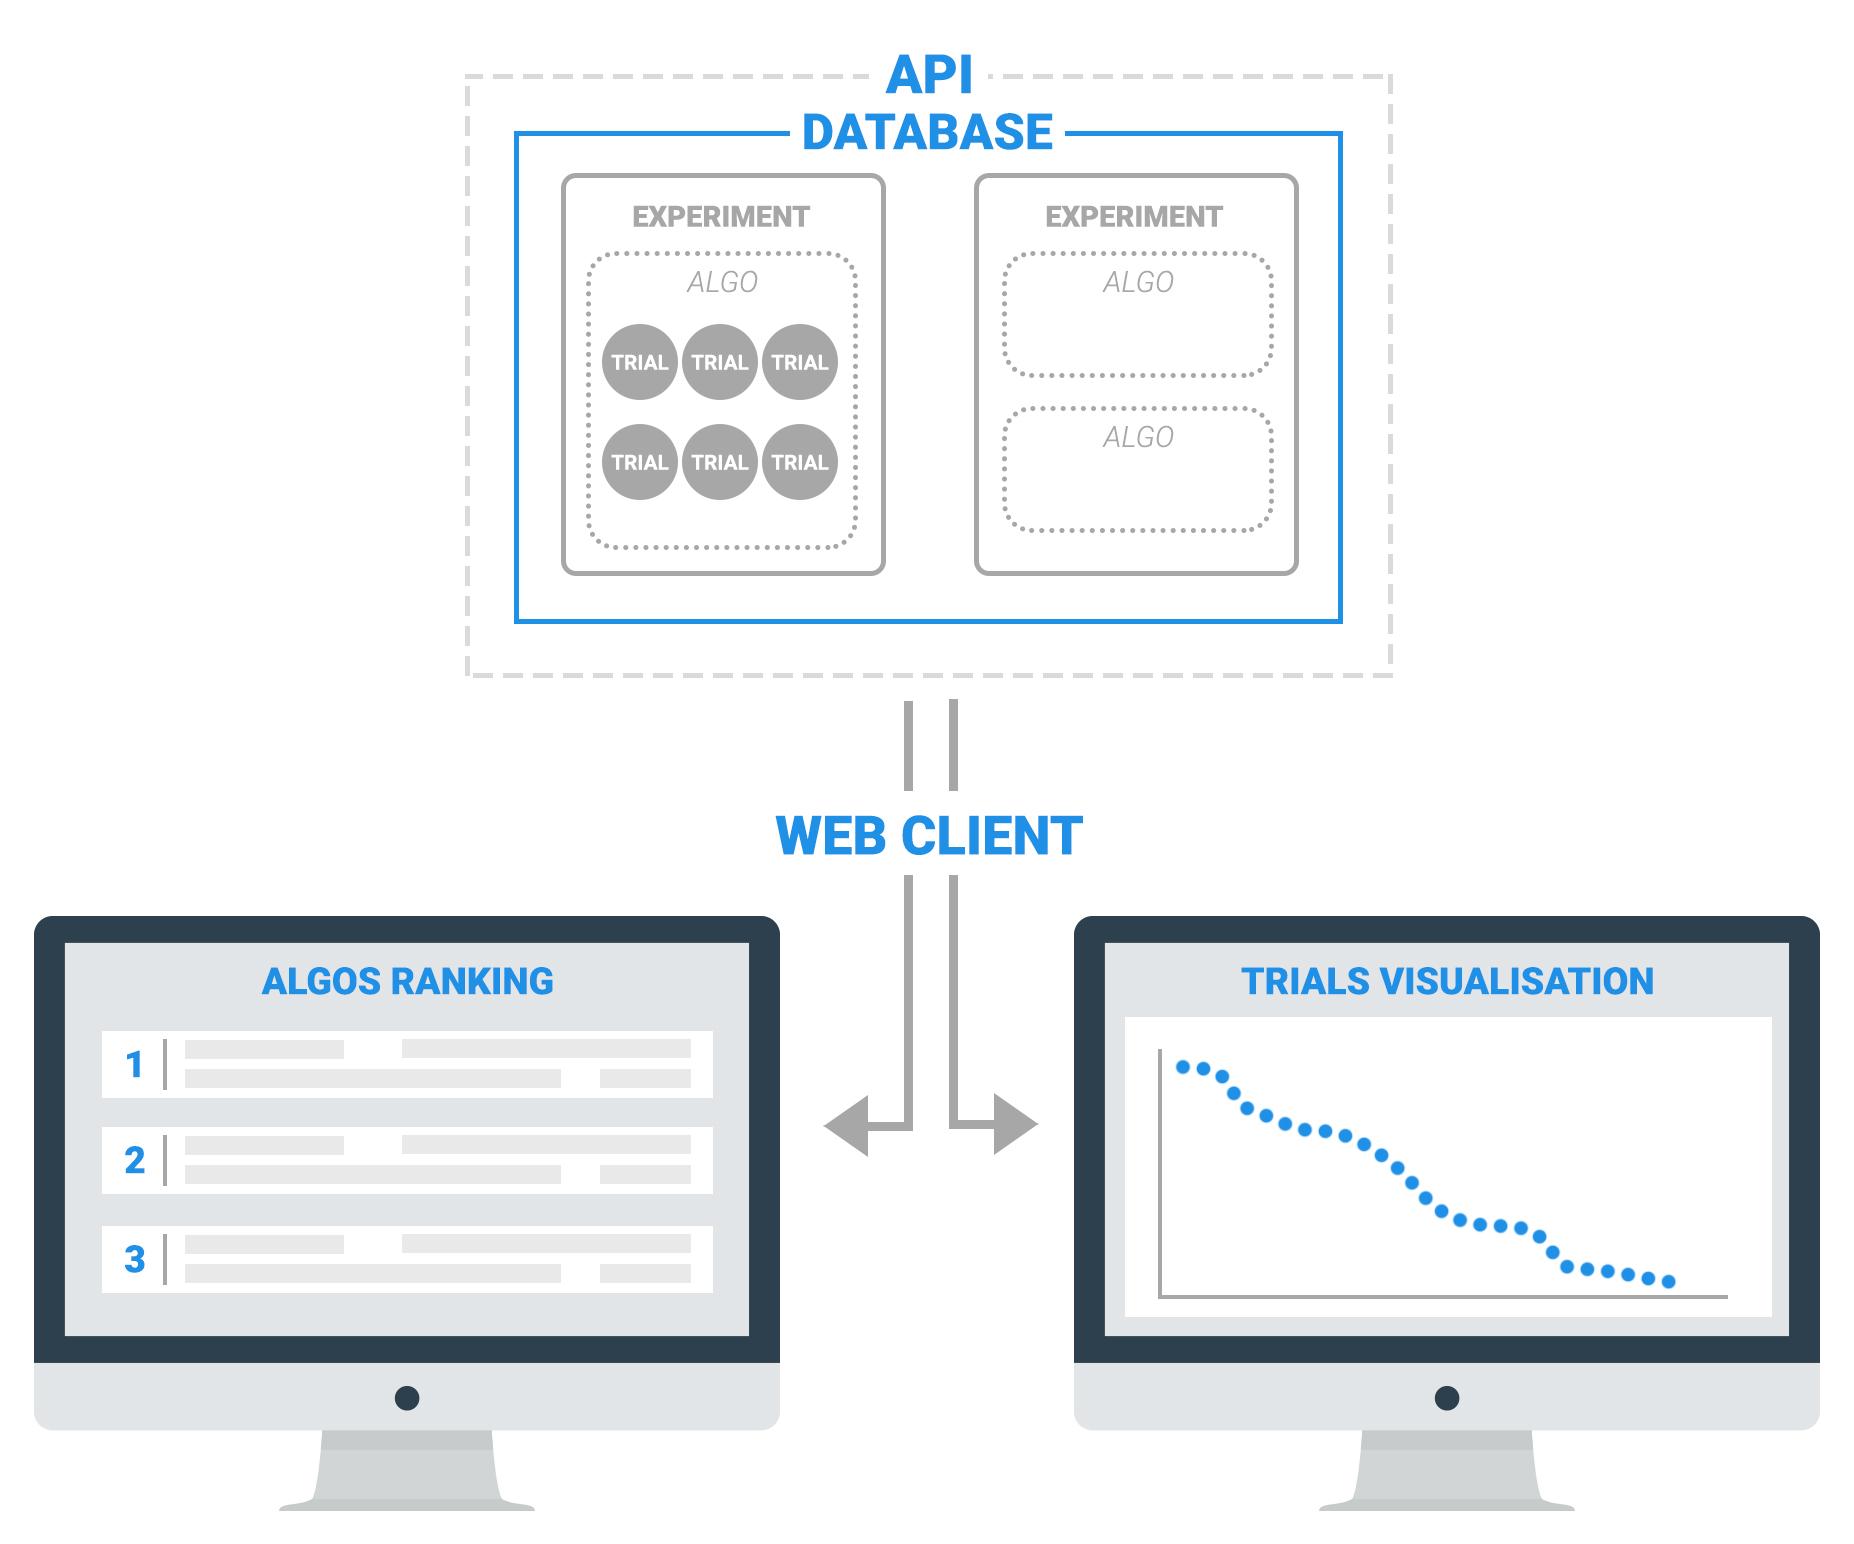 API - WEB CLIENT